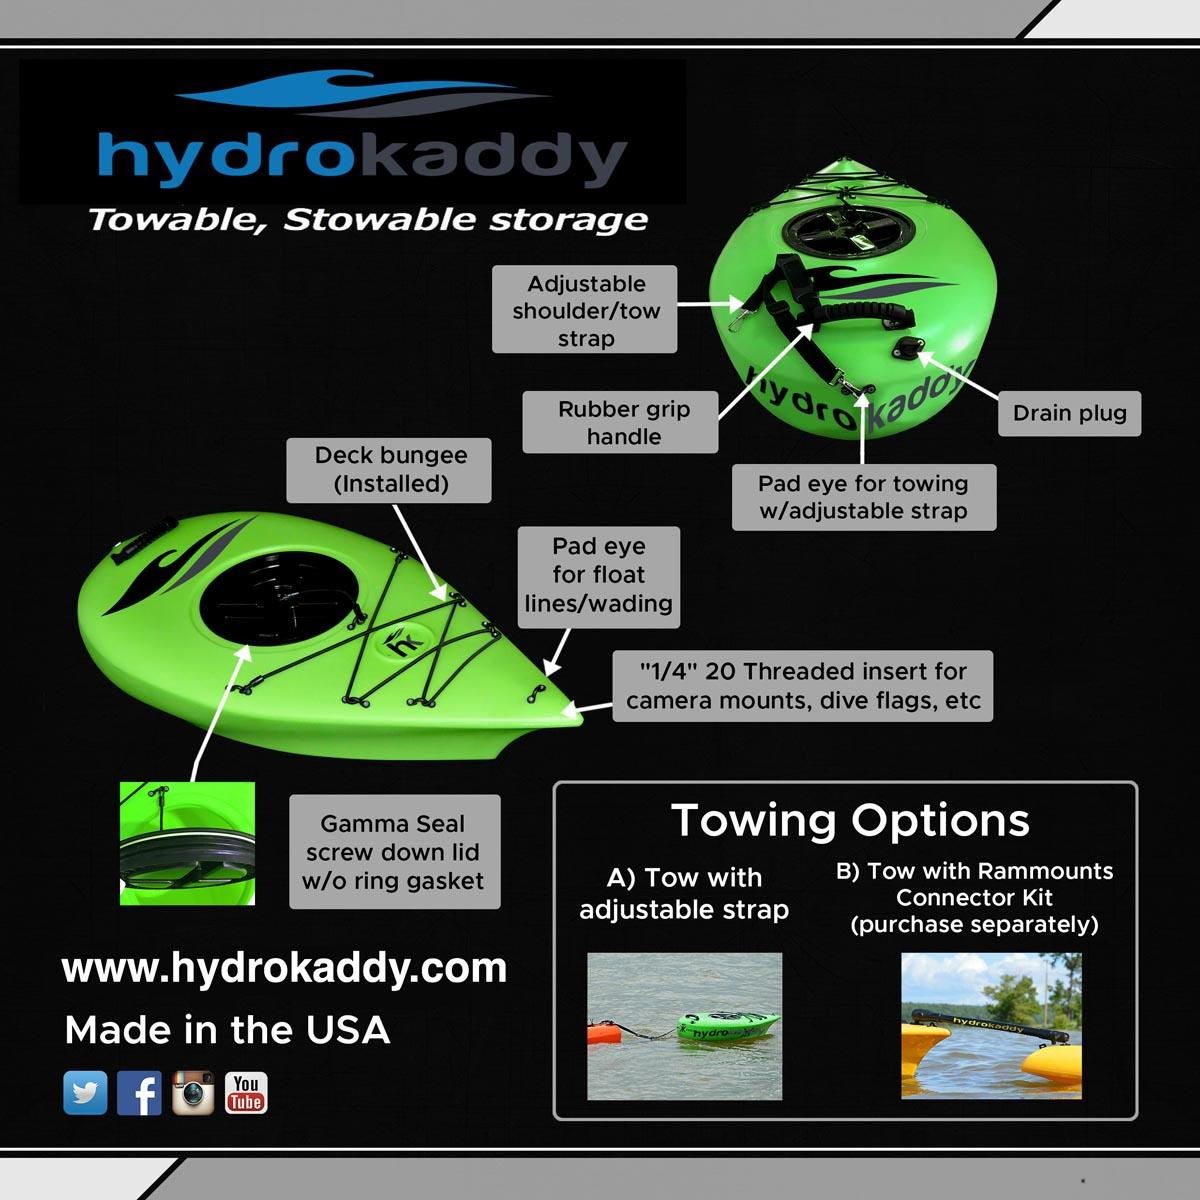 HydroKaddysm.jpg